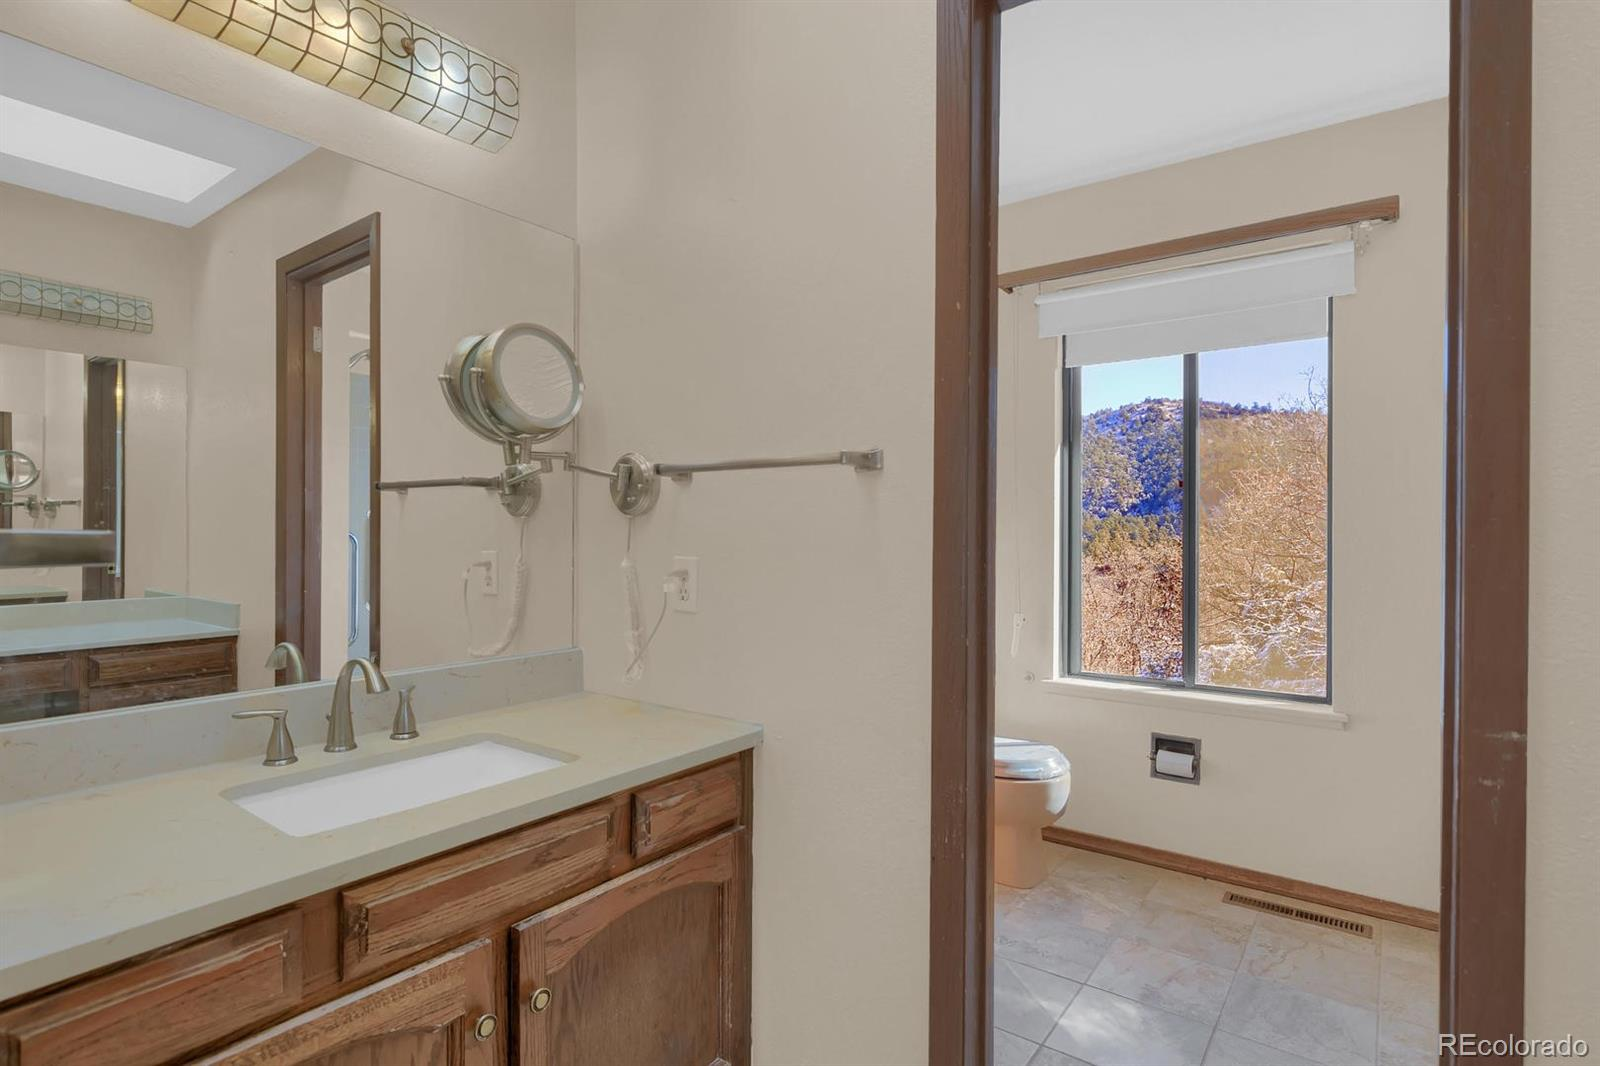 MLS# 2704020 - 17 - 11440 Valle Verde Drive, Colorado Springs, CO 80926